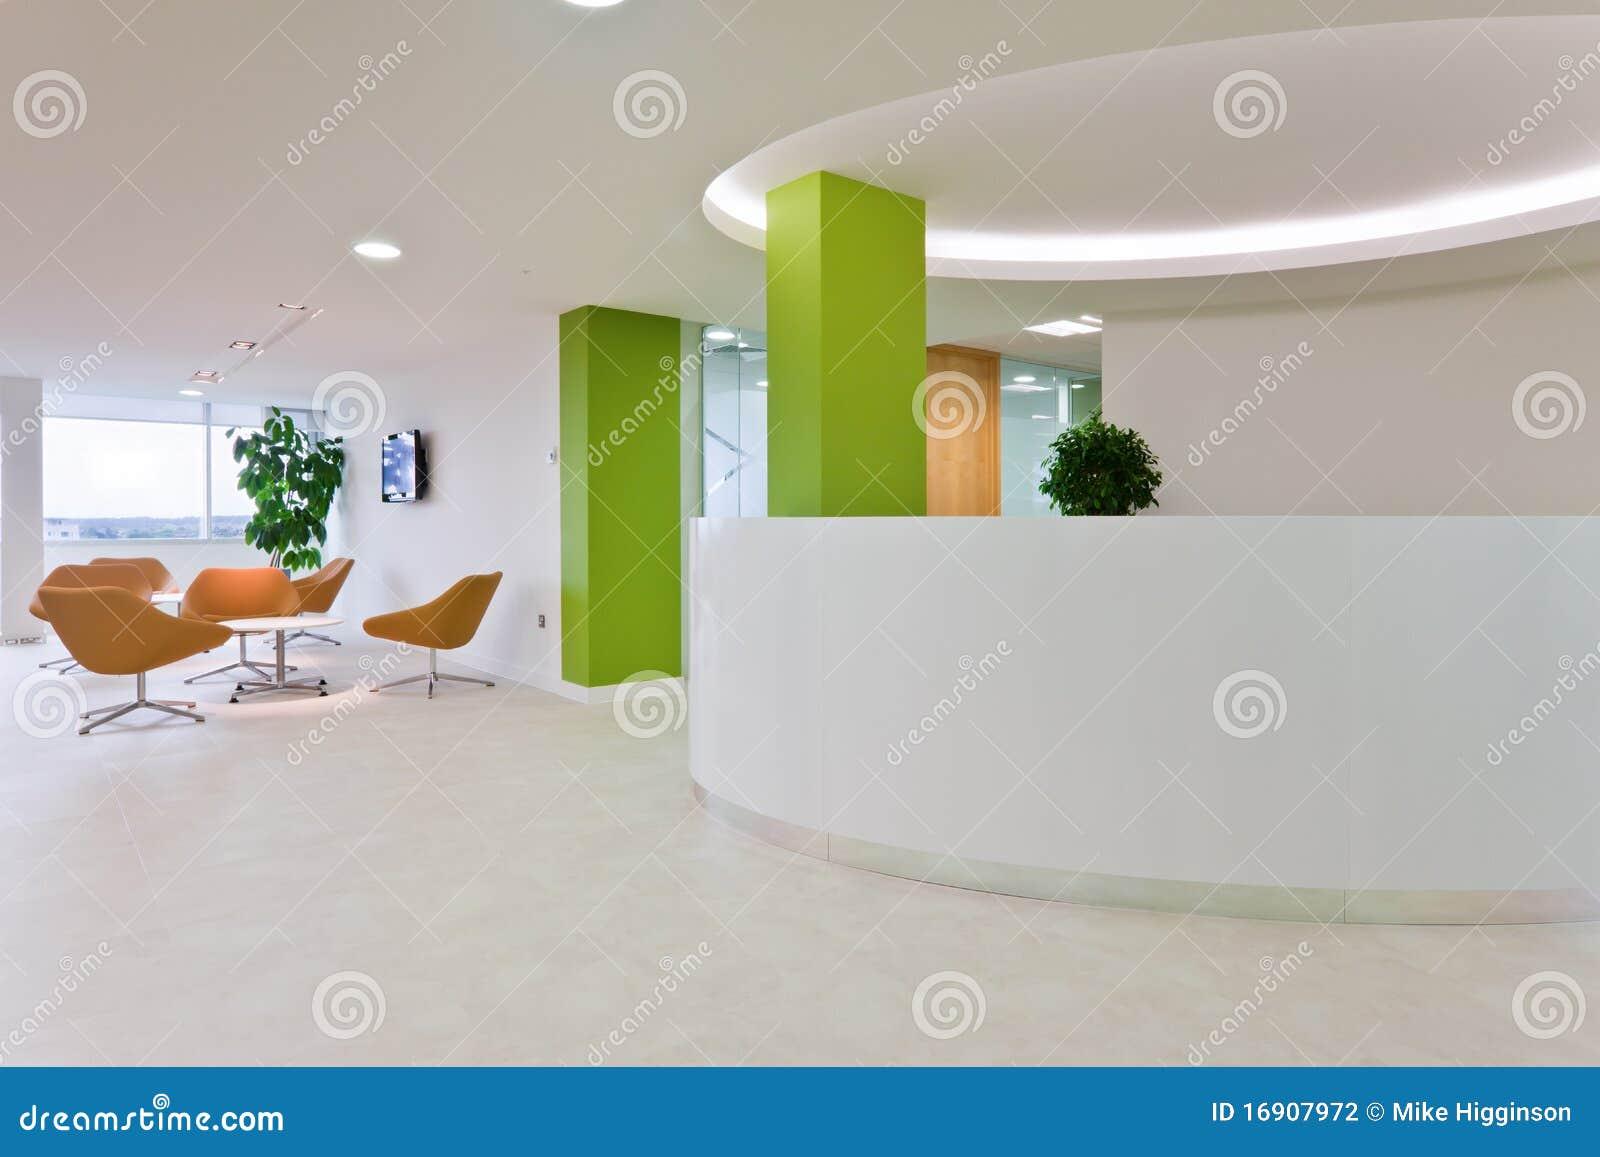 Recepci n moderna de la oficina for Recepcion oficina moderna